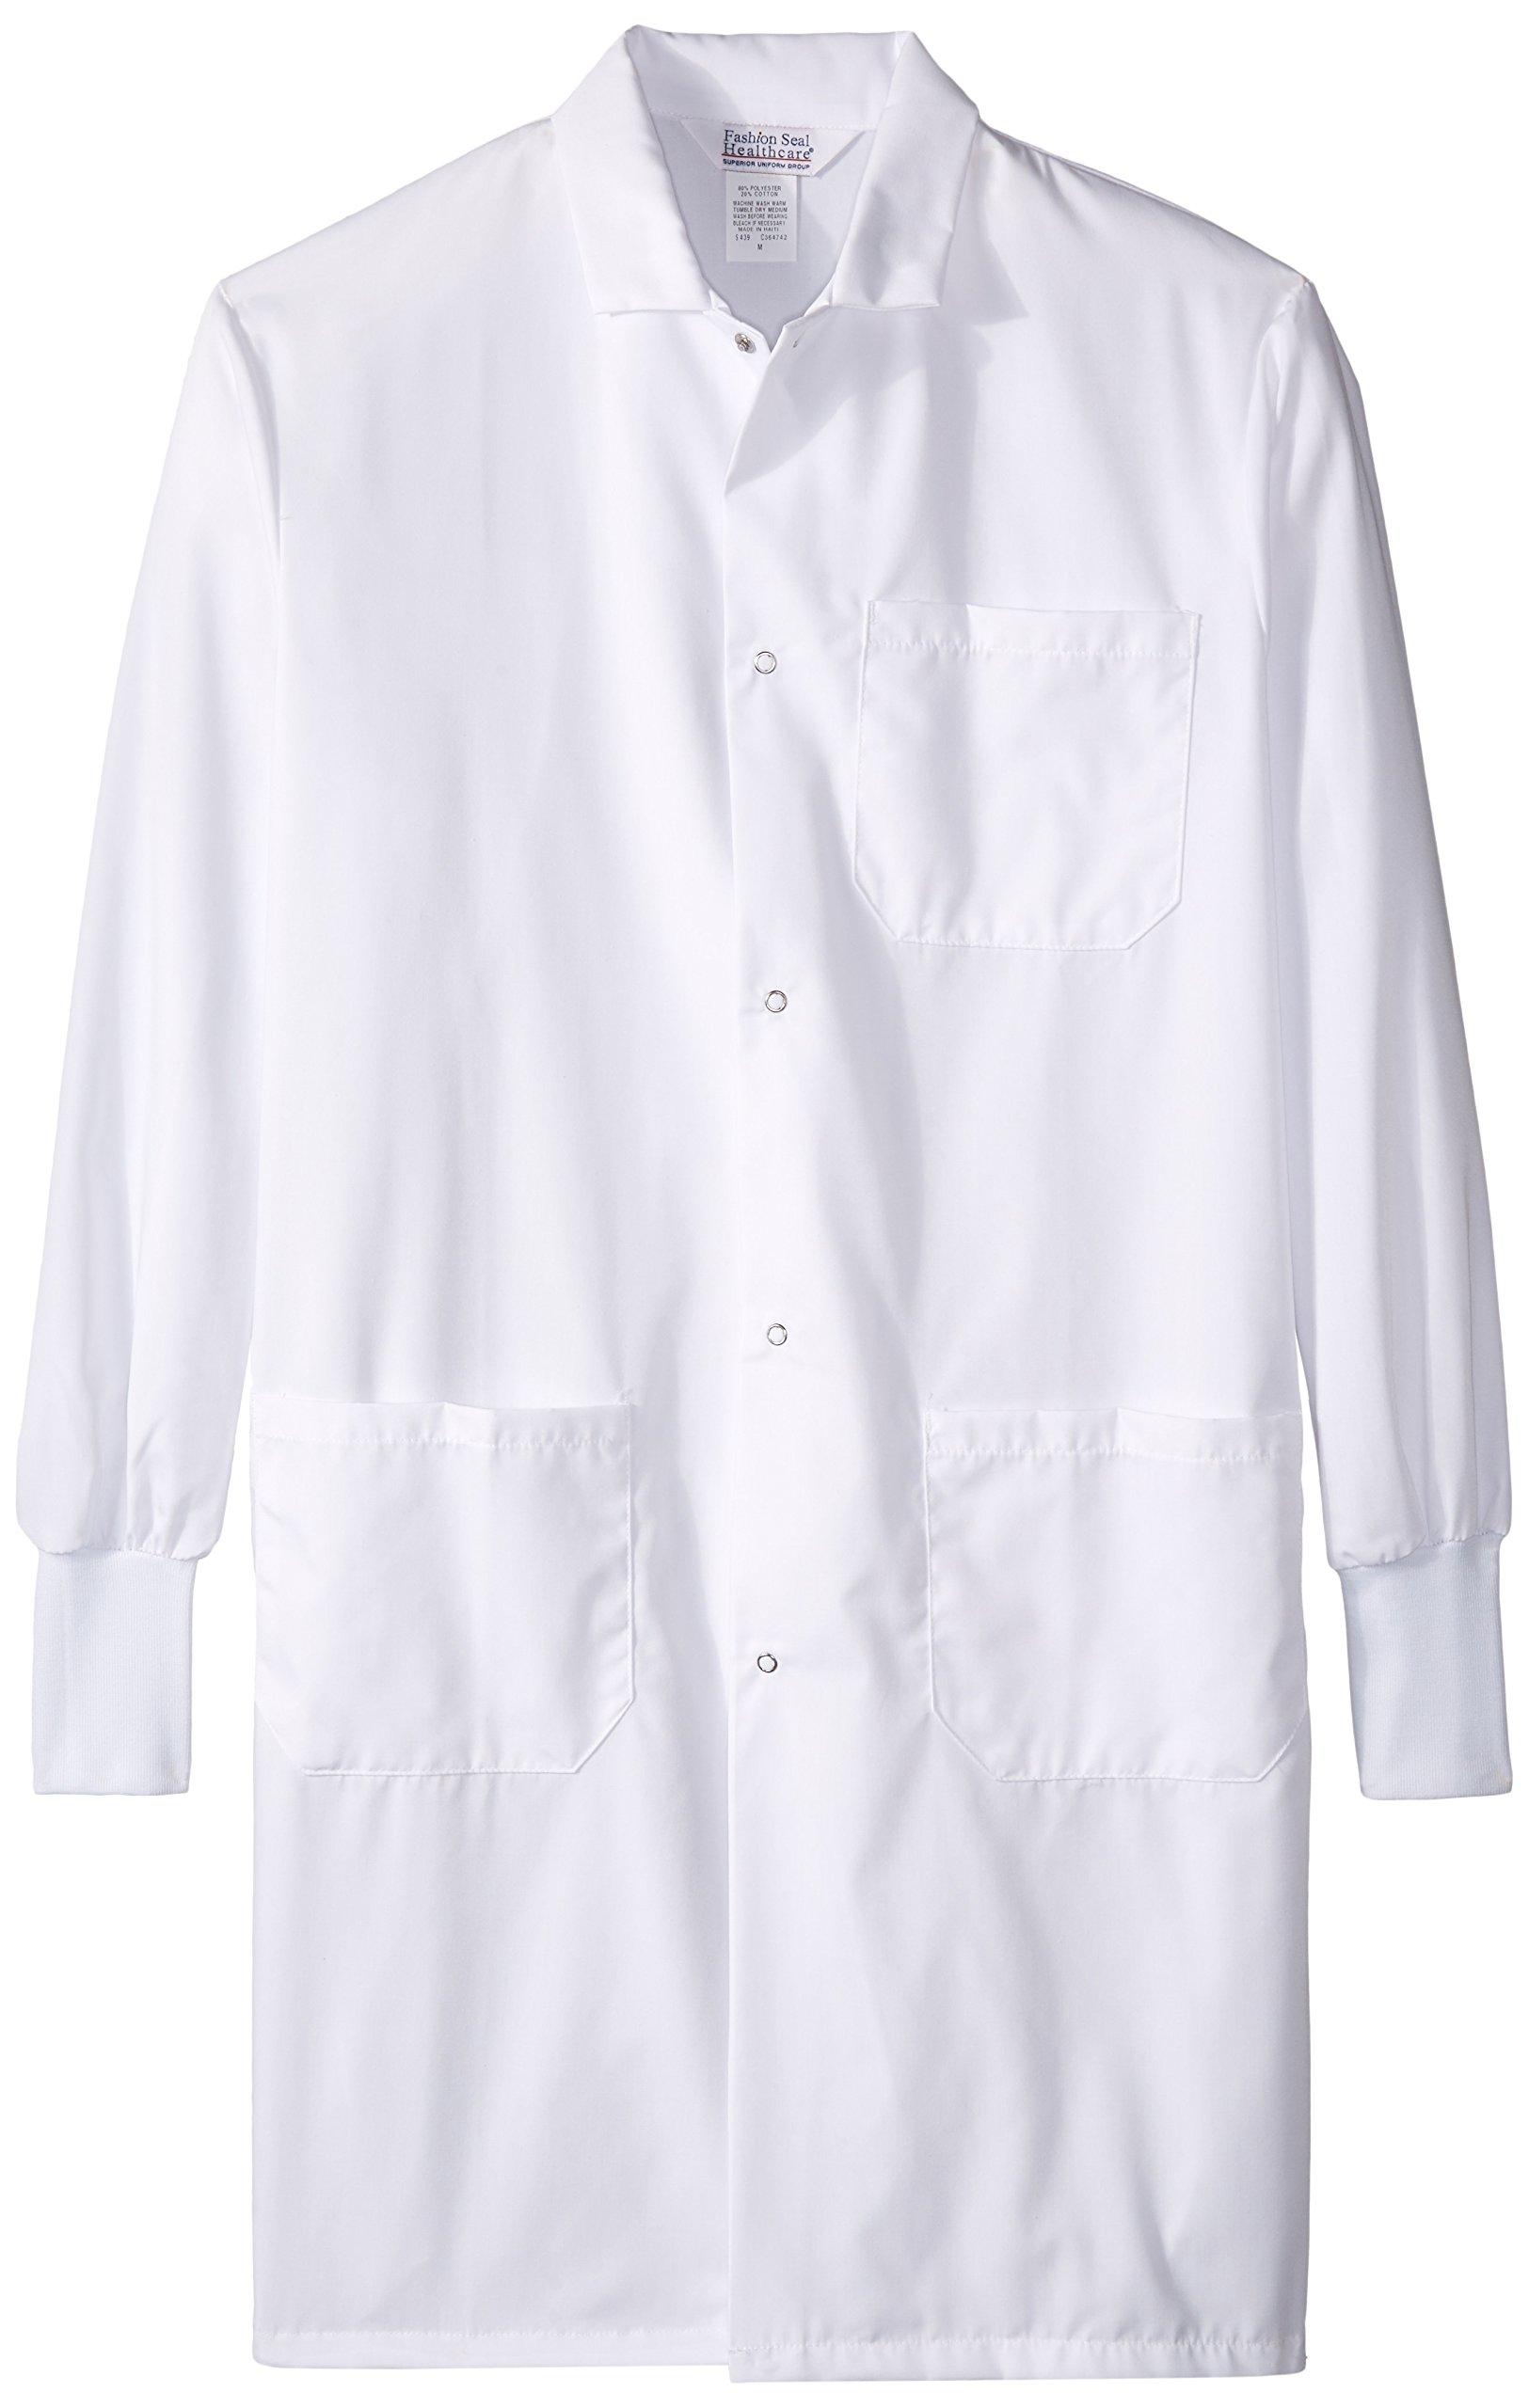 Worklon 439M Polyester/Cotton Lab Coats with Convertible Collar, 41'' Length, Medium, White